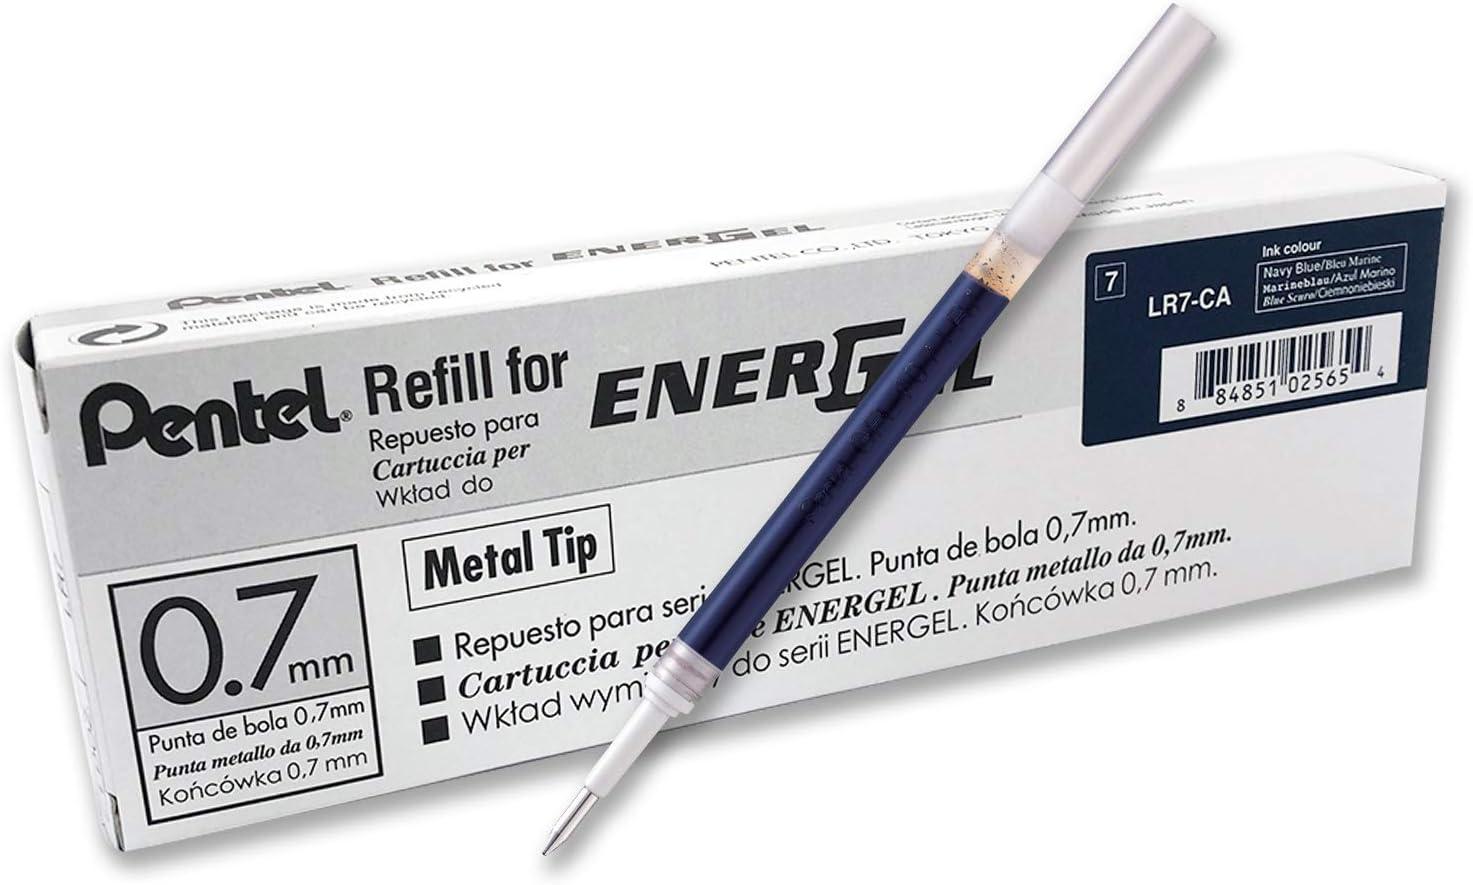 Pentel Refill Ink for EnerGel RTX Retractable Gel Pen, 12 Pack, 0.7mm, Medium Point, Navy Blue (LR7-CA)